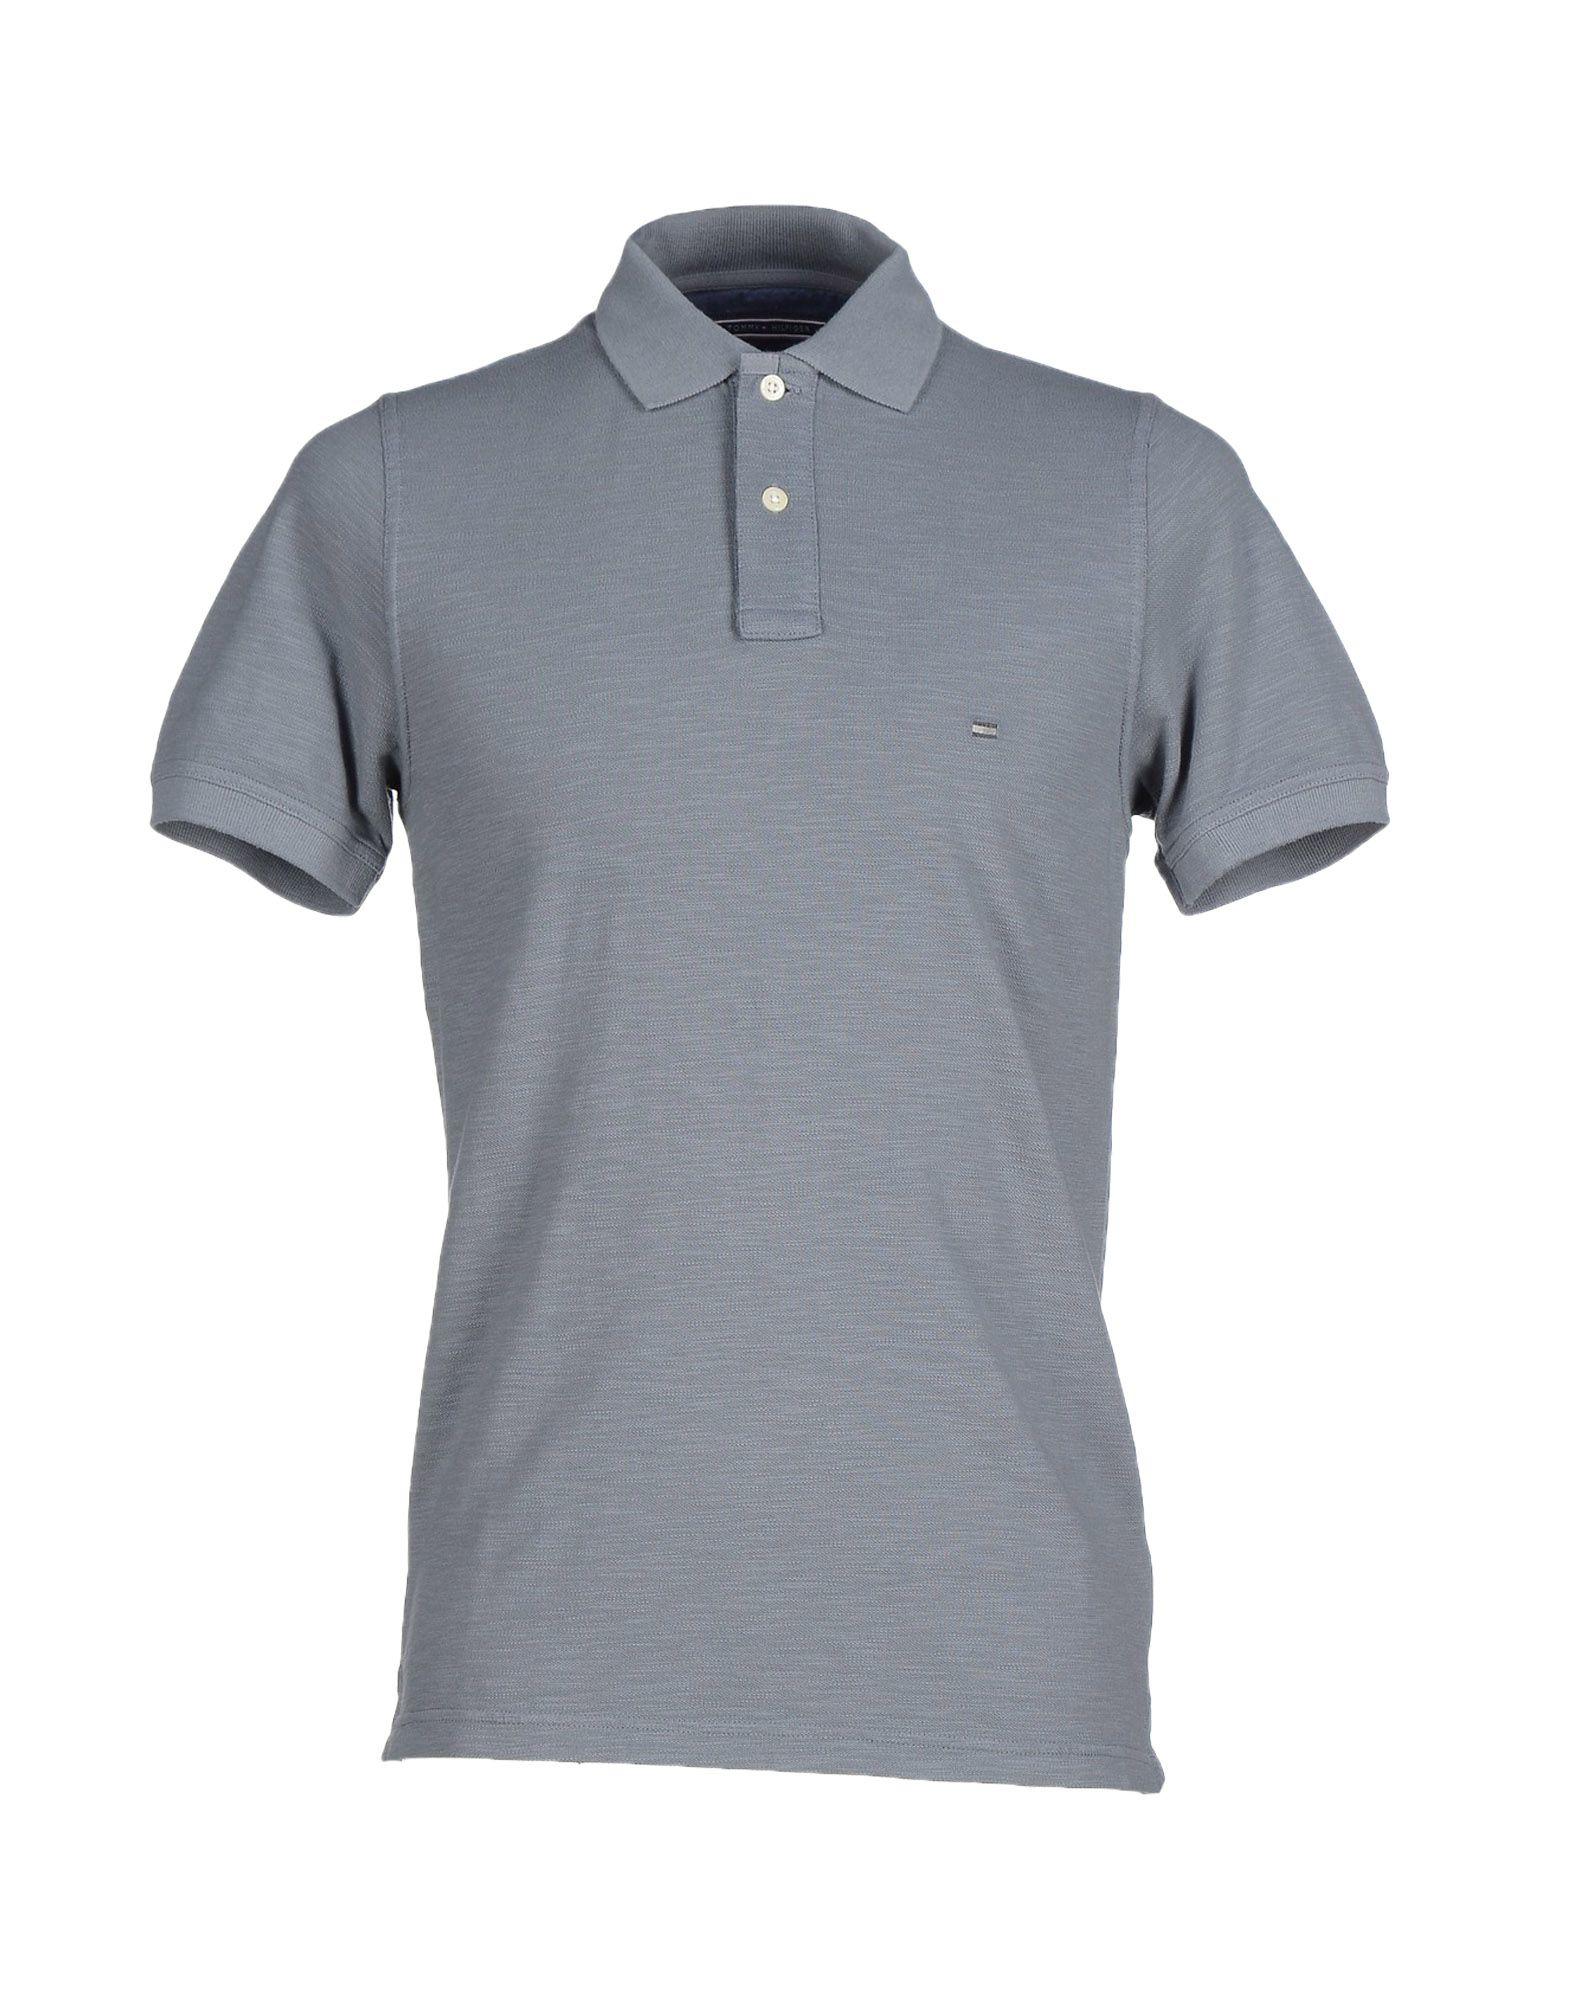 lyst tommy hilfiger polo shirt in gray for men. Black Bedroom Furniture Sets. Home Design Ideas